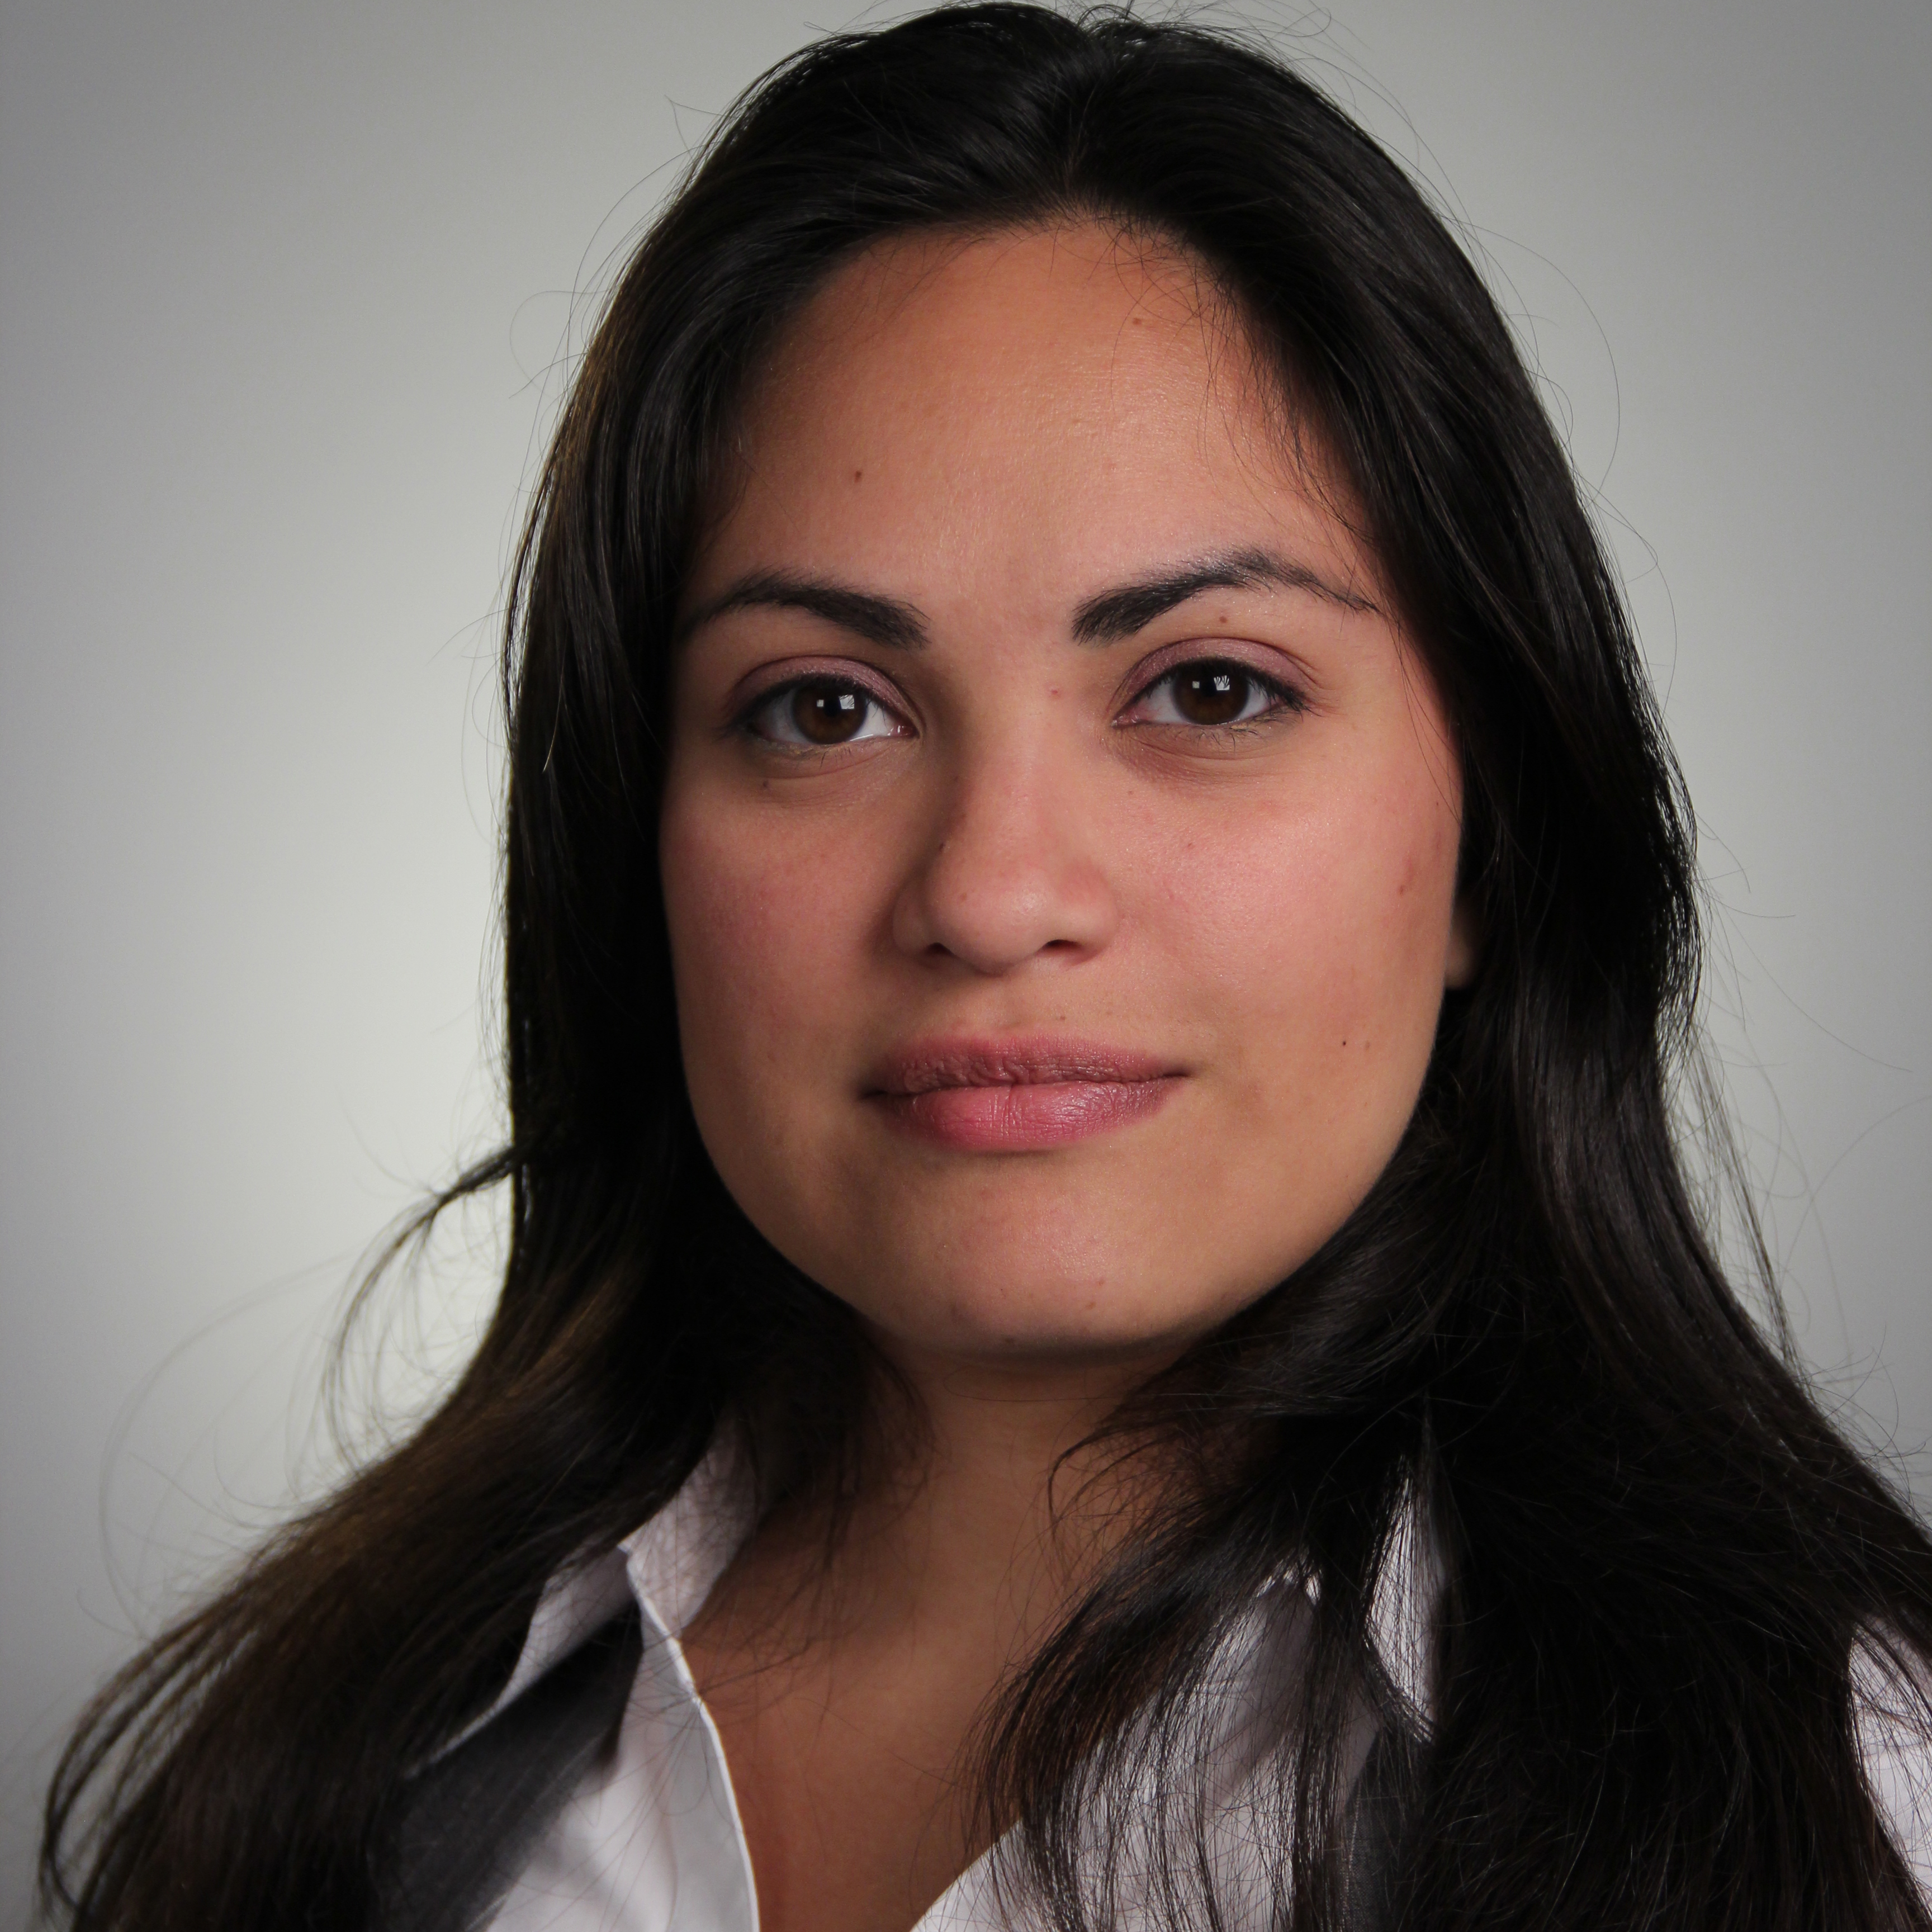 Capital_District_NY_Raquel_Gonzalez_-_Raquel_Gonzalez.JPG